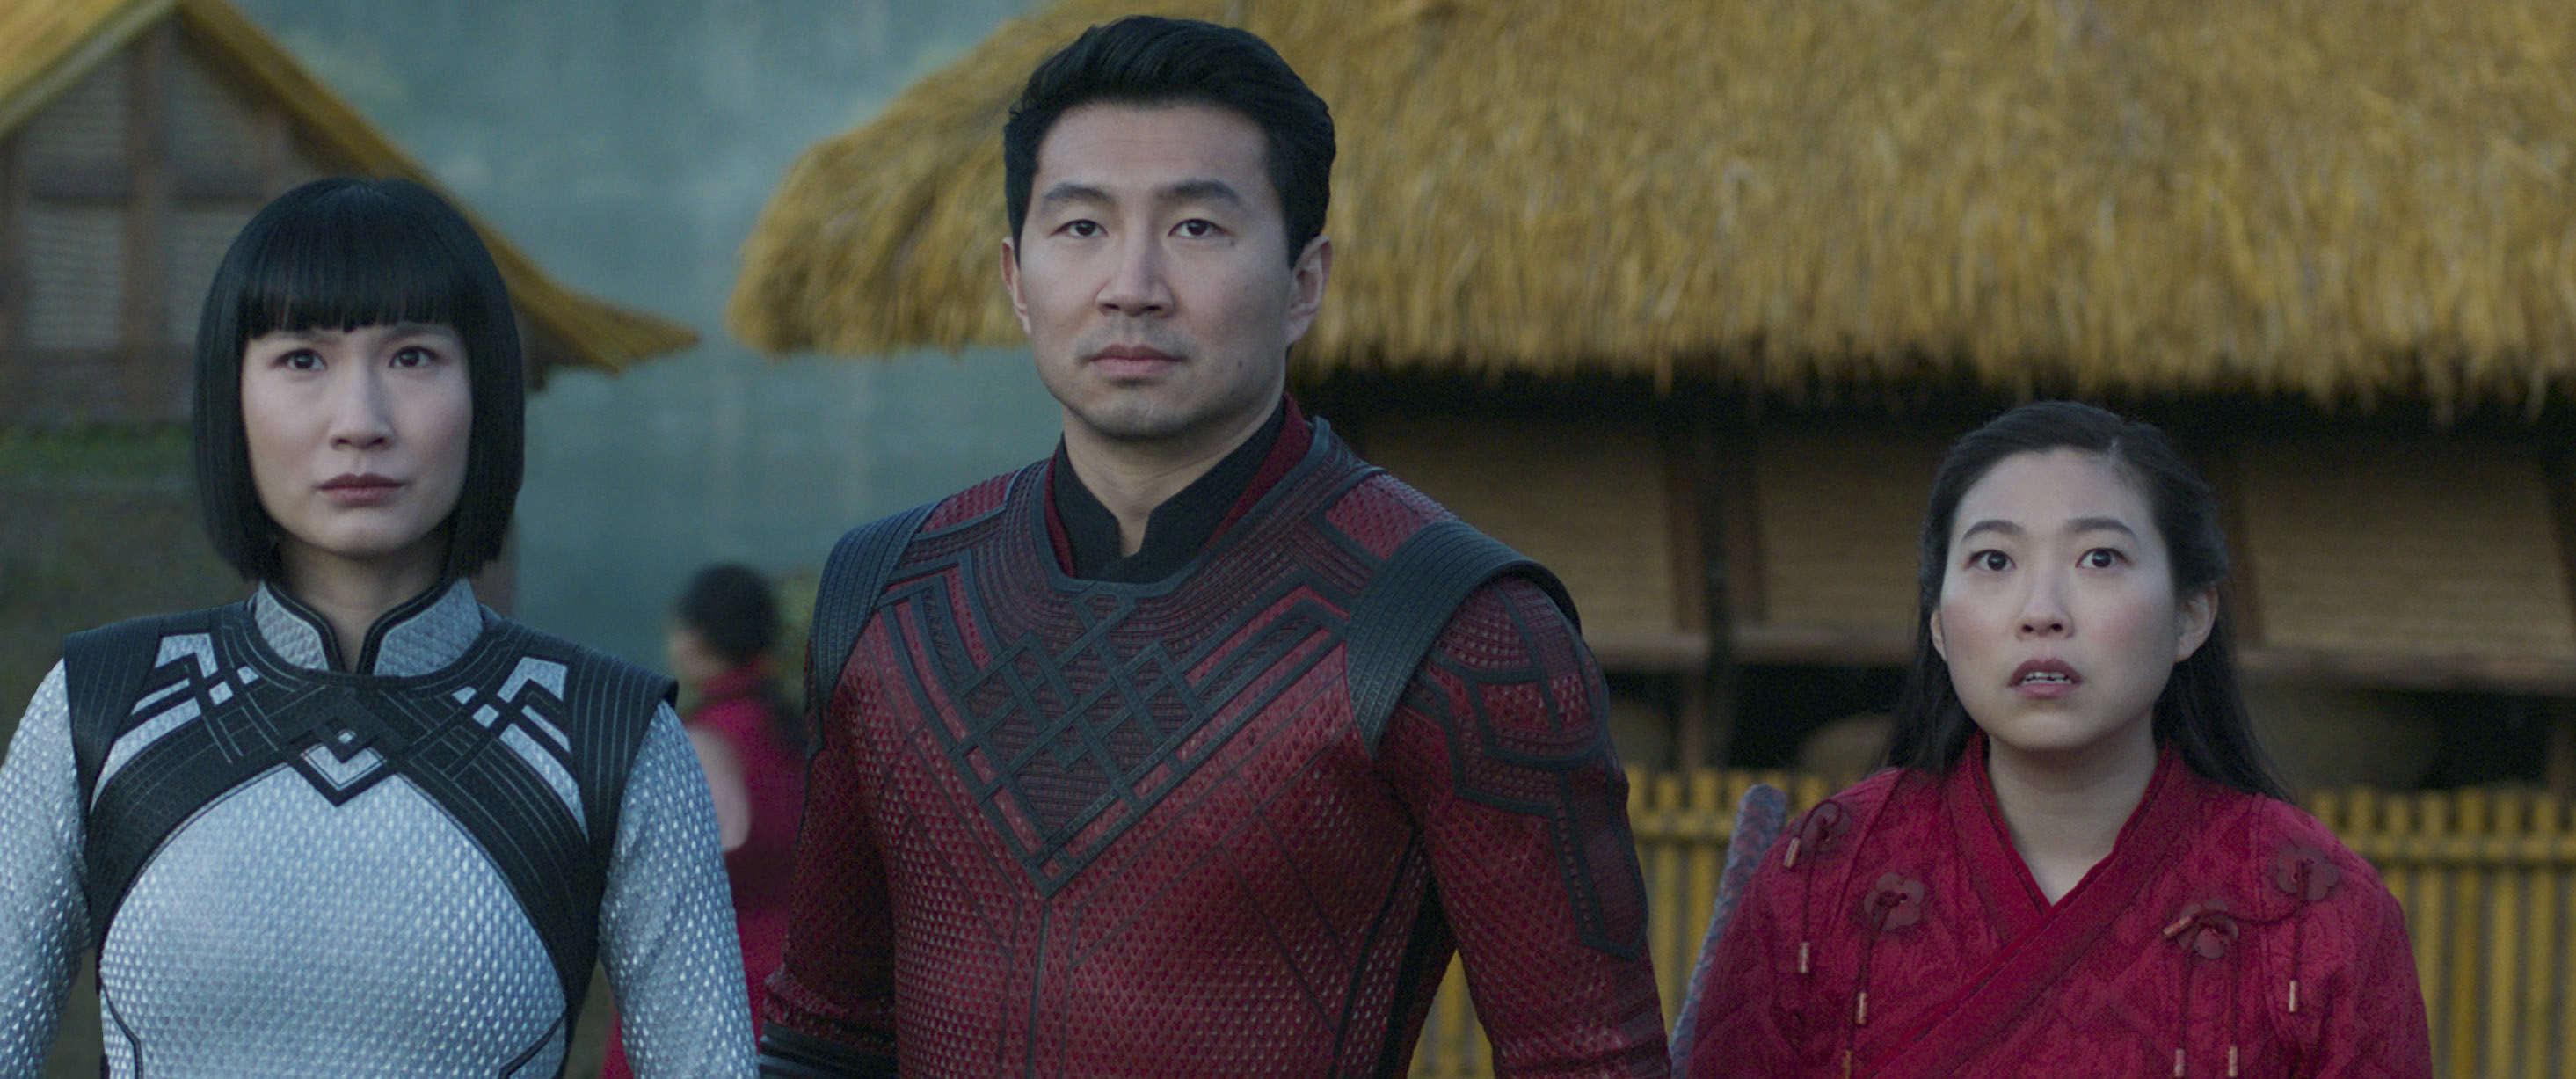 Marvel's Kevin Feige addresses China's 'Shang-Chi' concerns, Fu Manchu